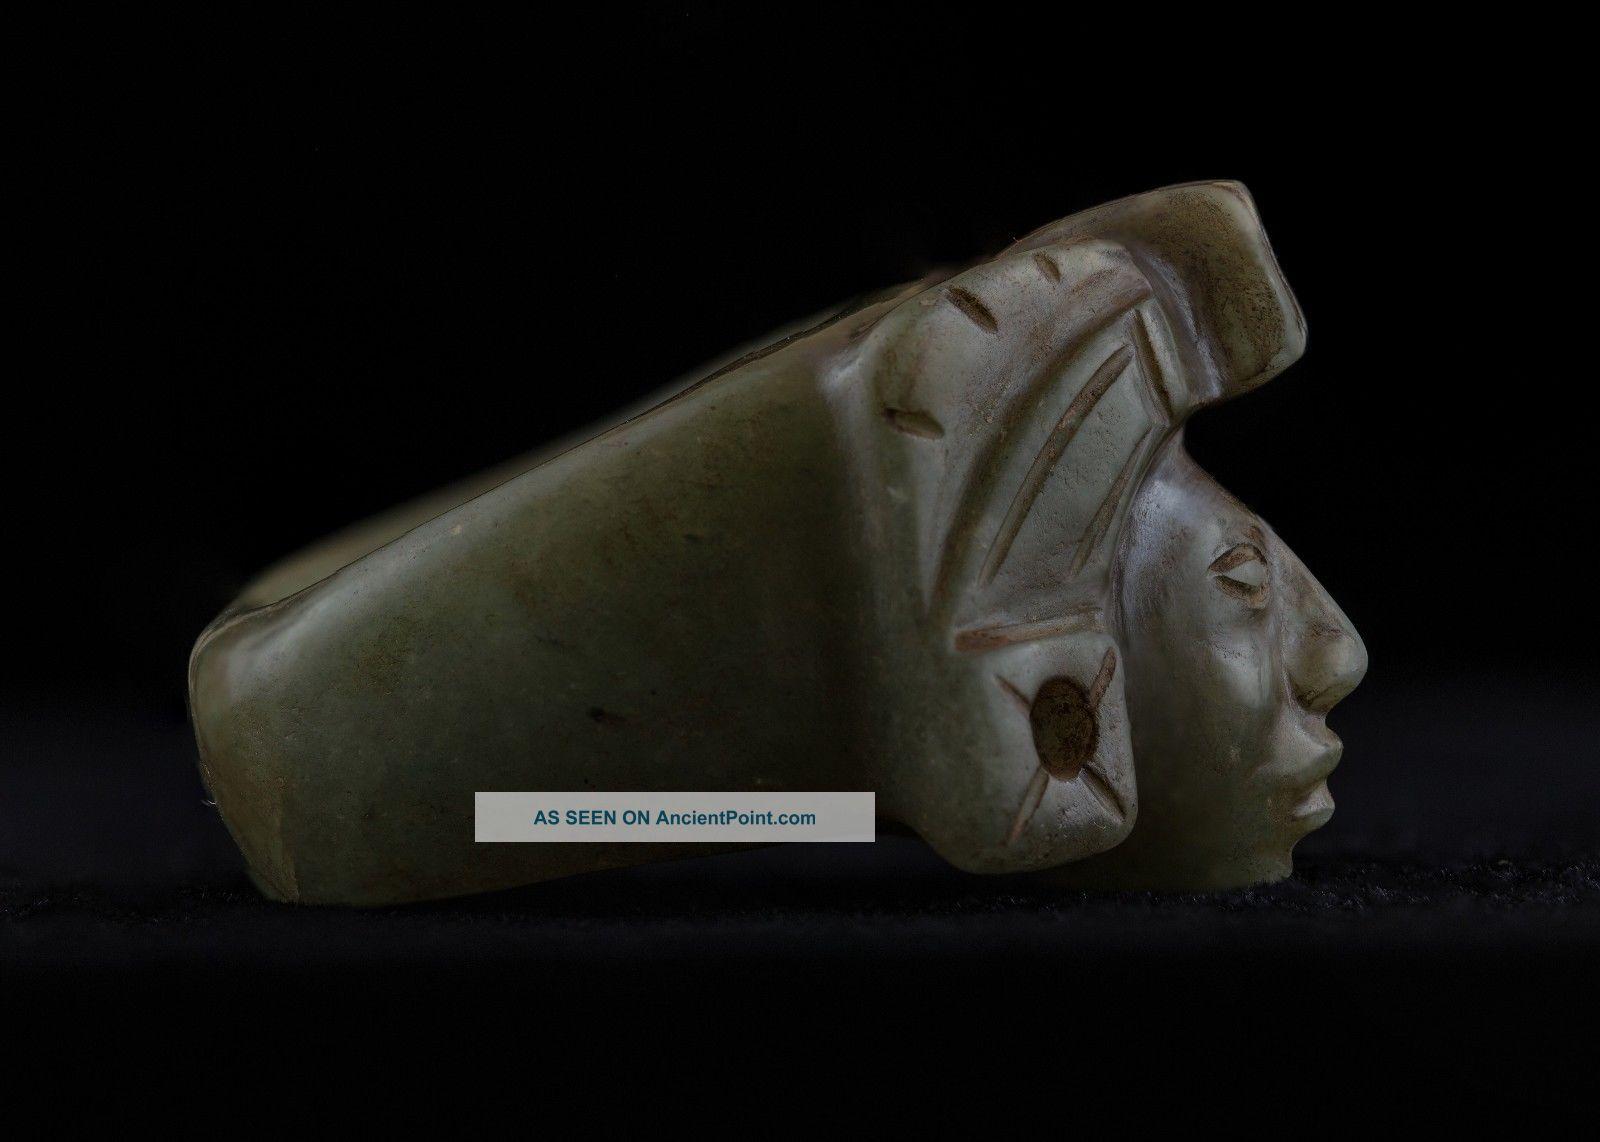 Pre Columbian Mayan Ring Stone Figurine - Antique Statue - Olmec Mayan Aztec The Americas photo